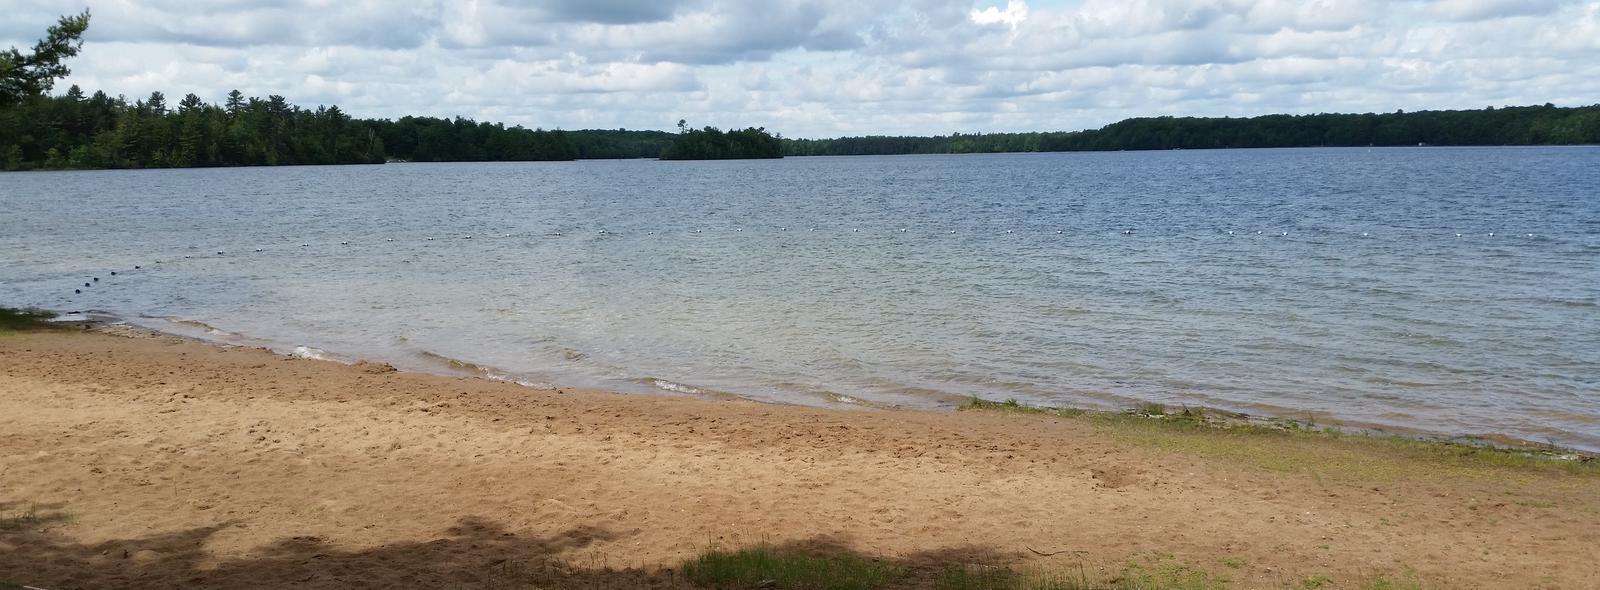 Franklin Lake BeachFranklin Lake Beach